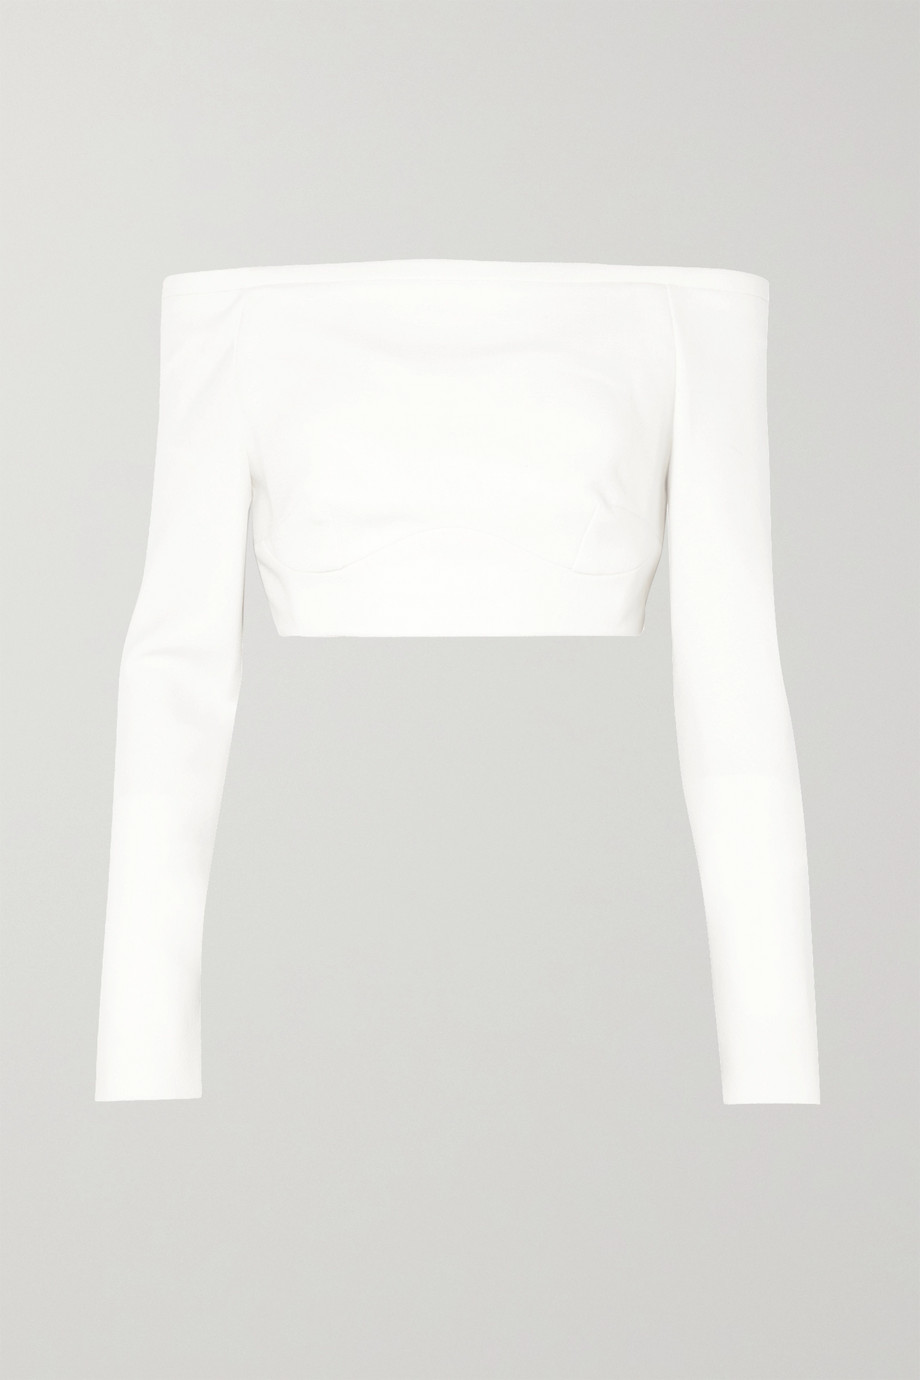 Emilia Wickstead Gerda off-the-shoulder wool-crepe top